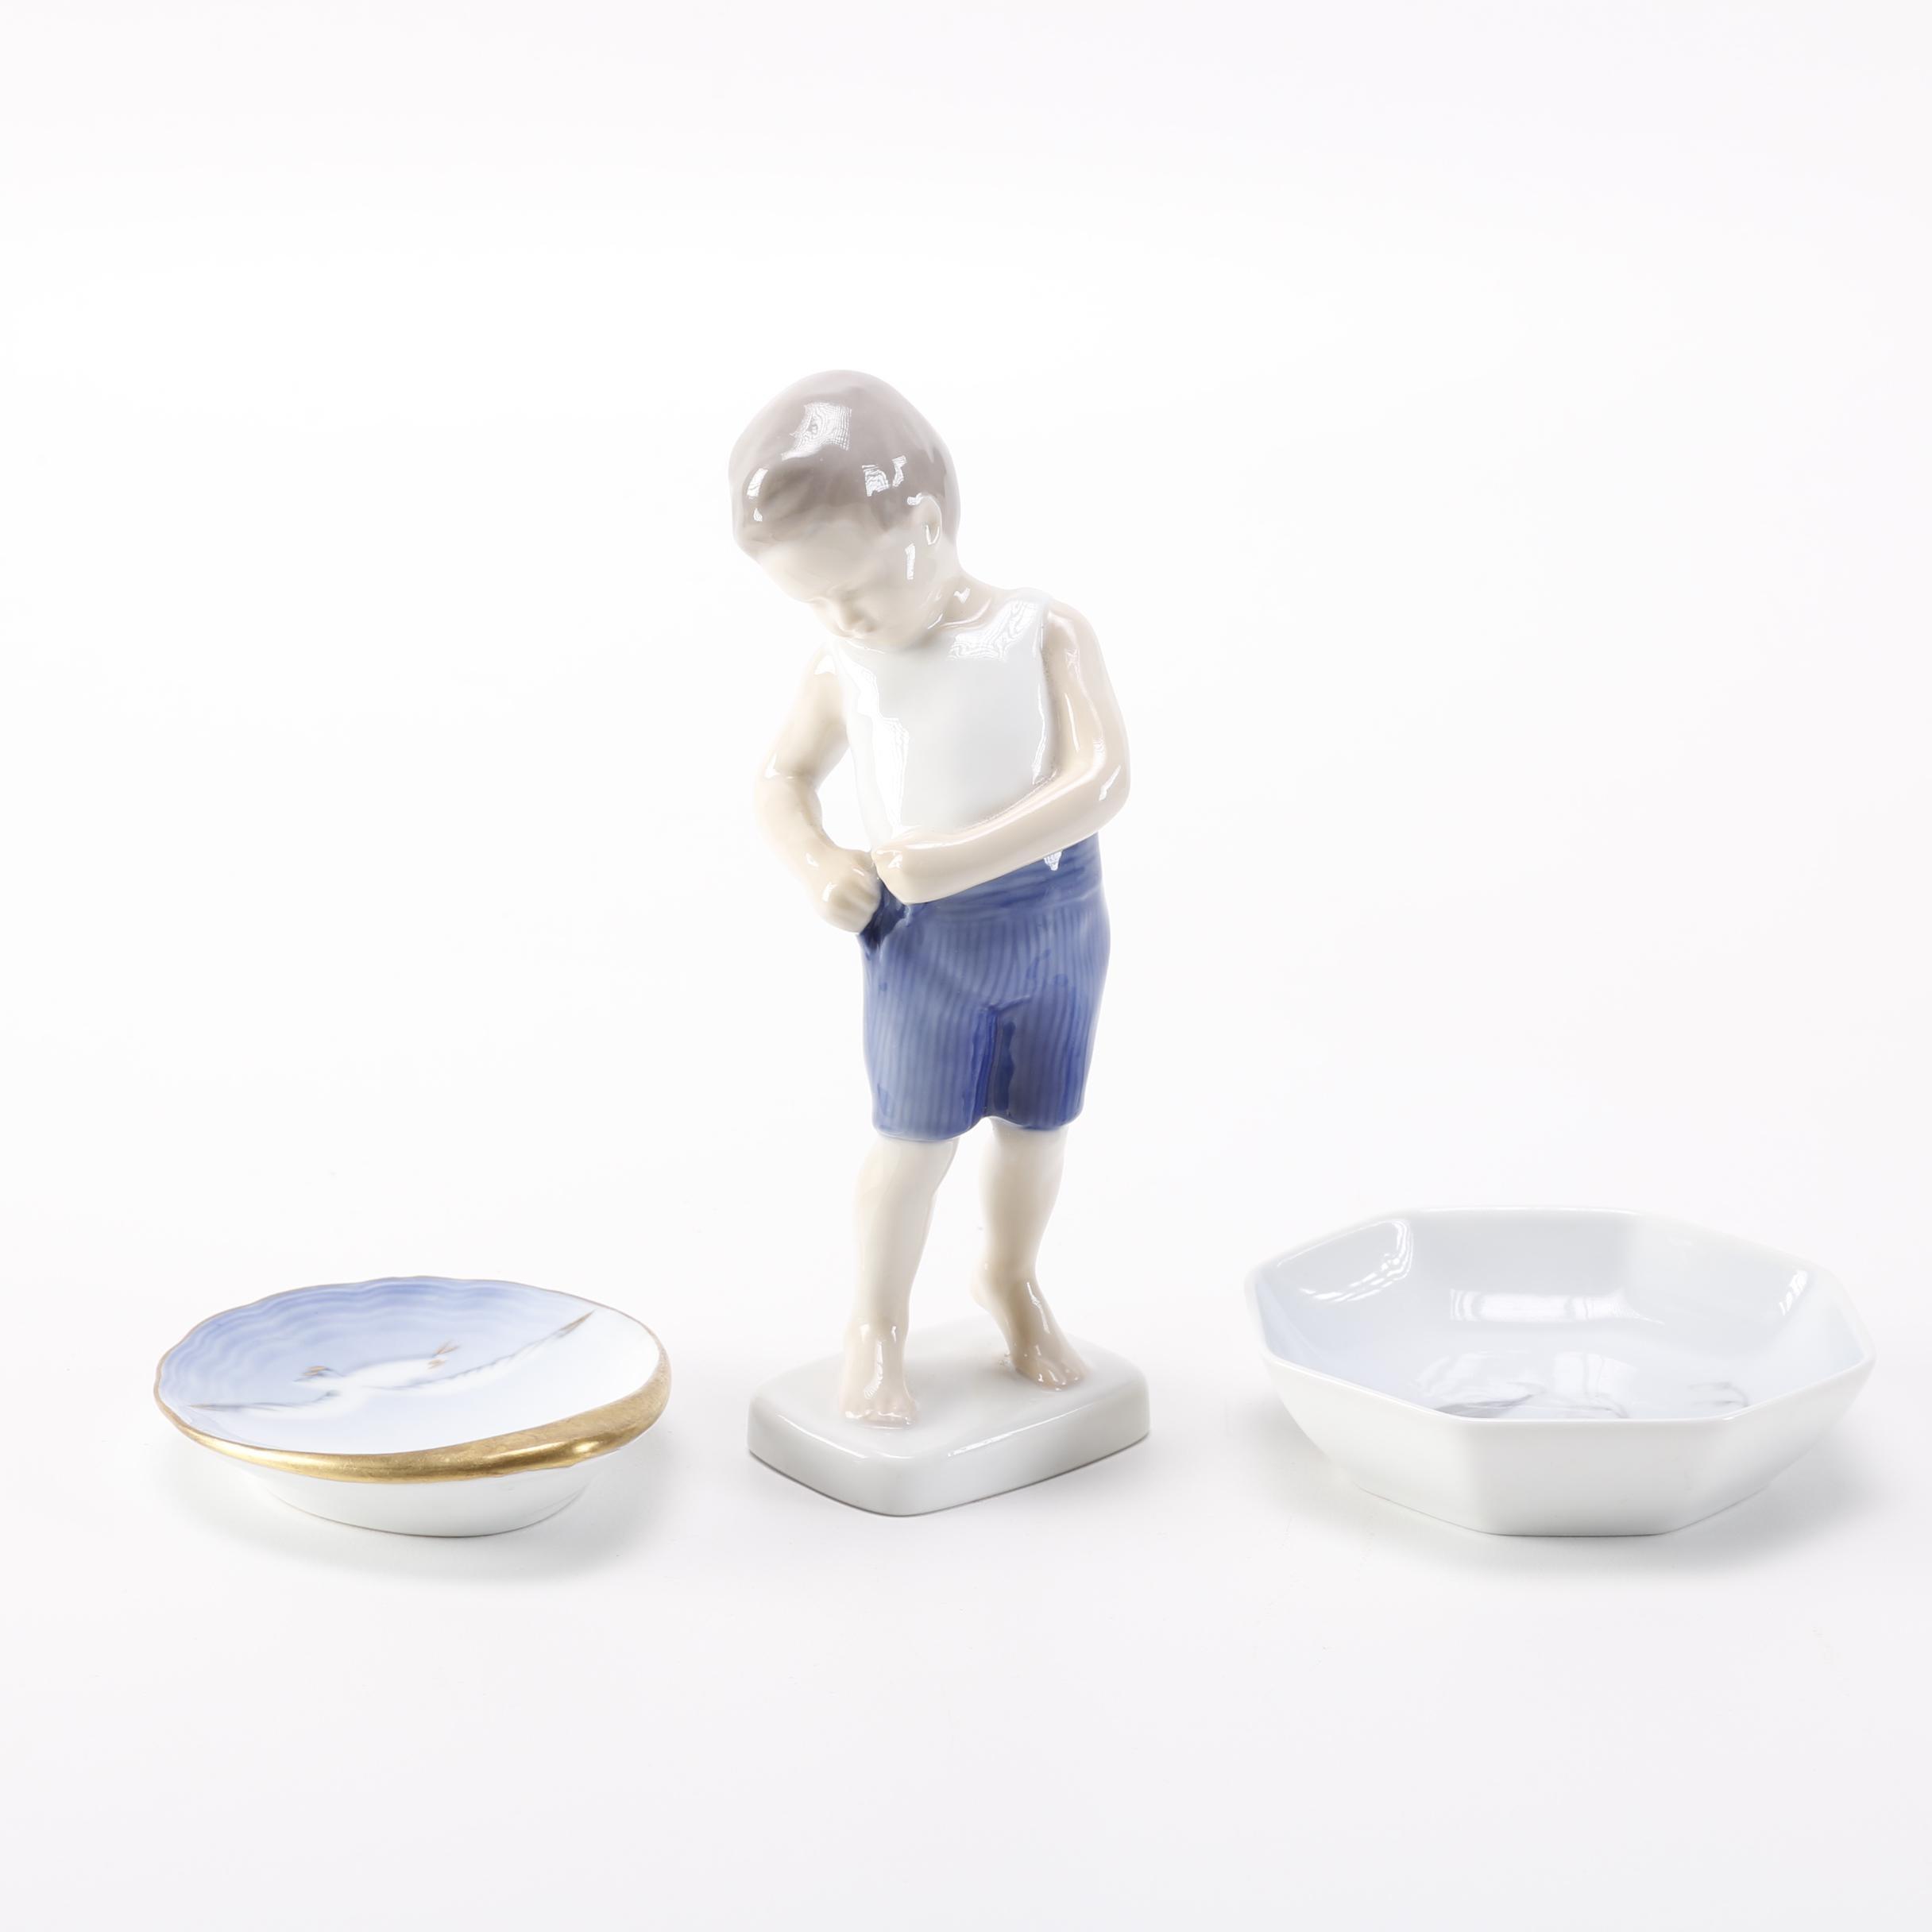 "Bing & Grøndahl Porcelain ""Boy Buttoning His Trousers"" Figurine"